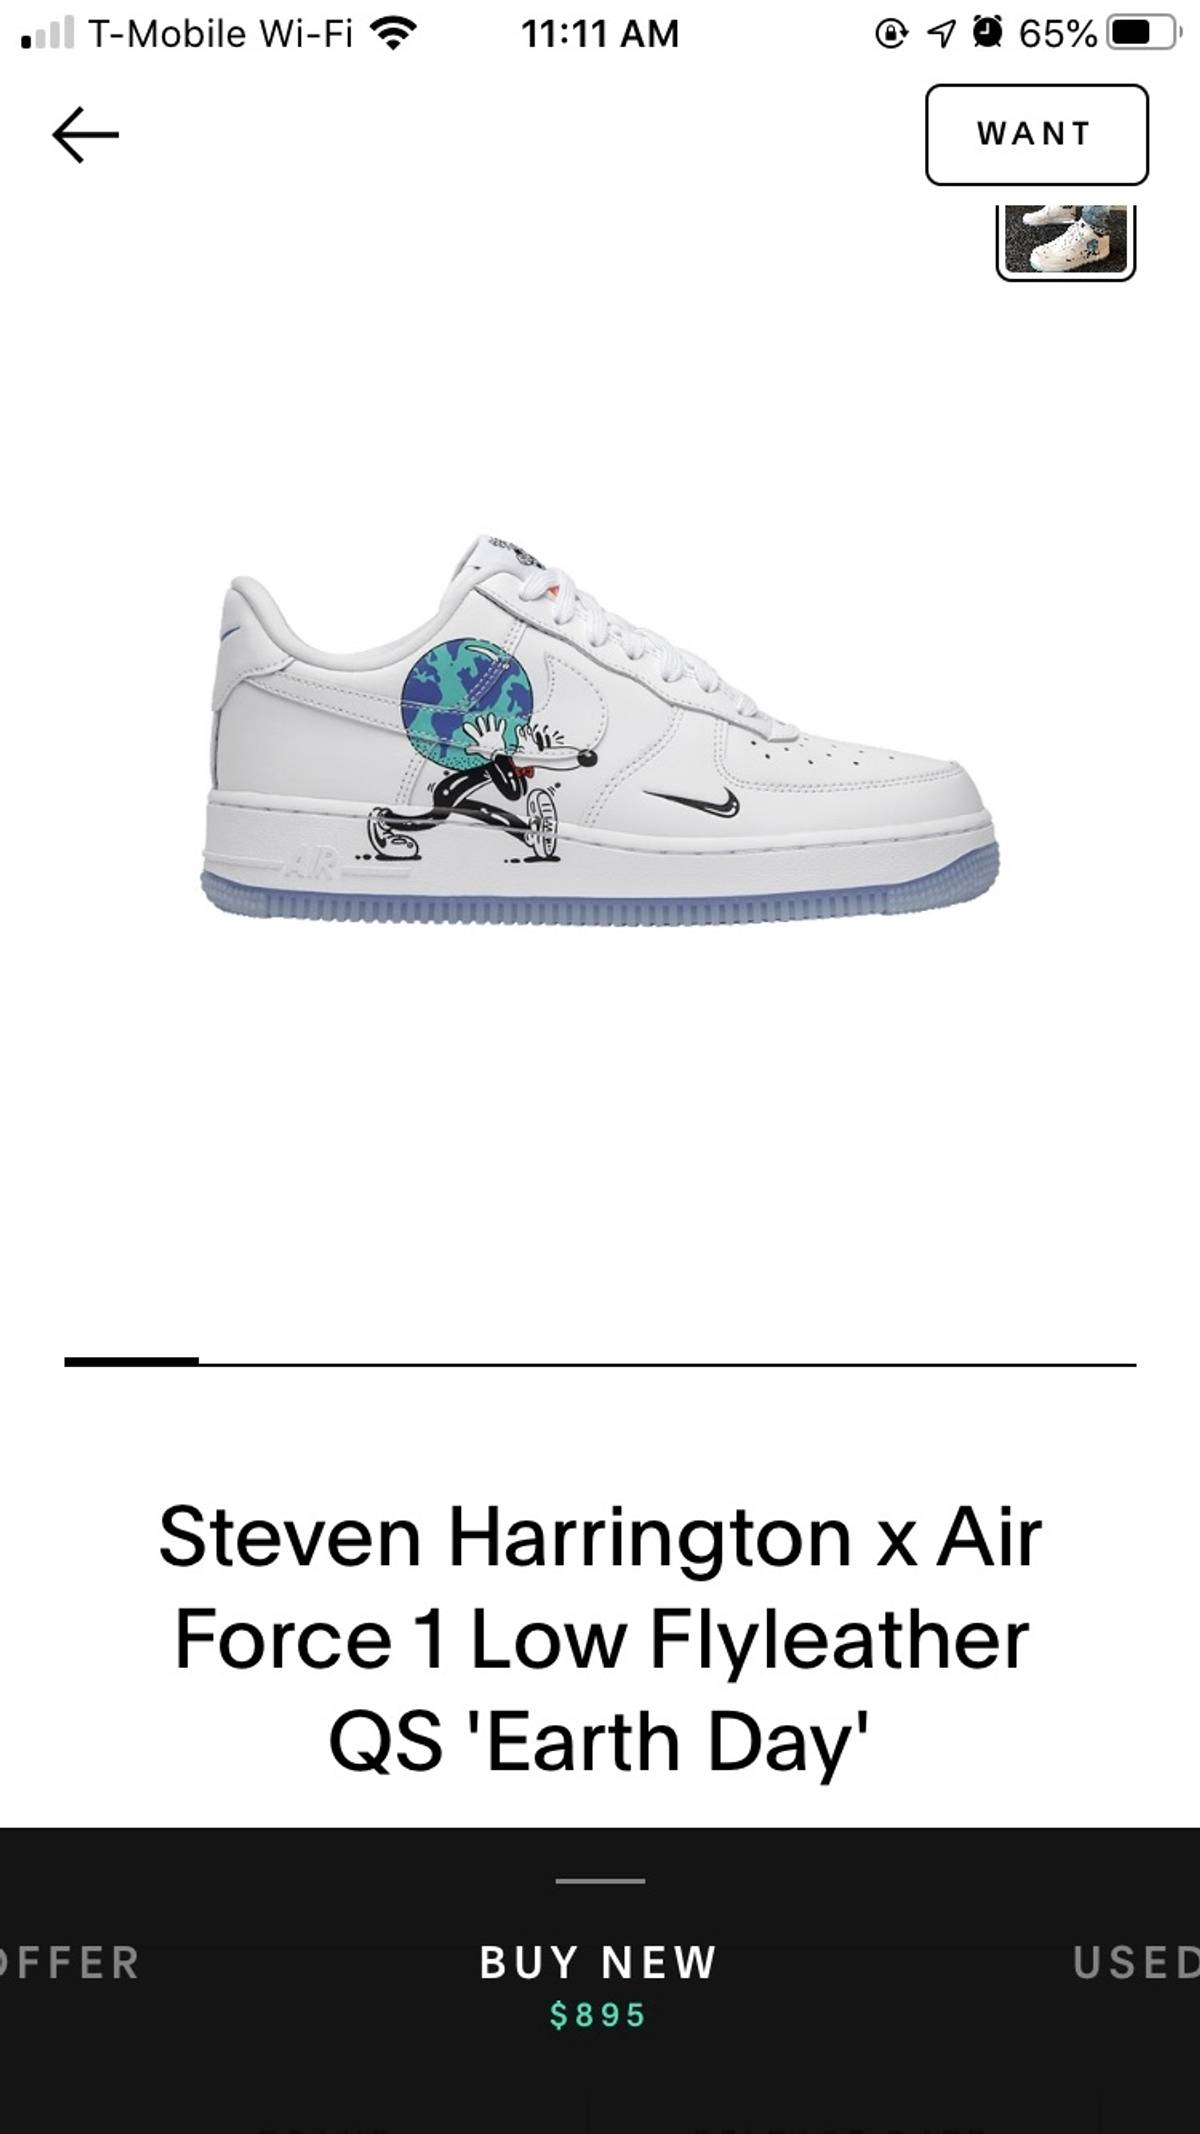 Nike Air Force 1 Flyleather Steve Harrington Earth Day (2019) Size 7 $450